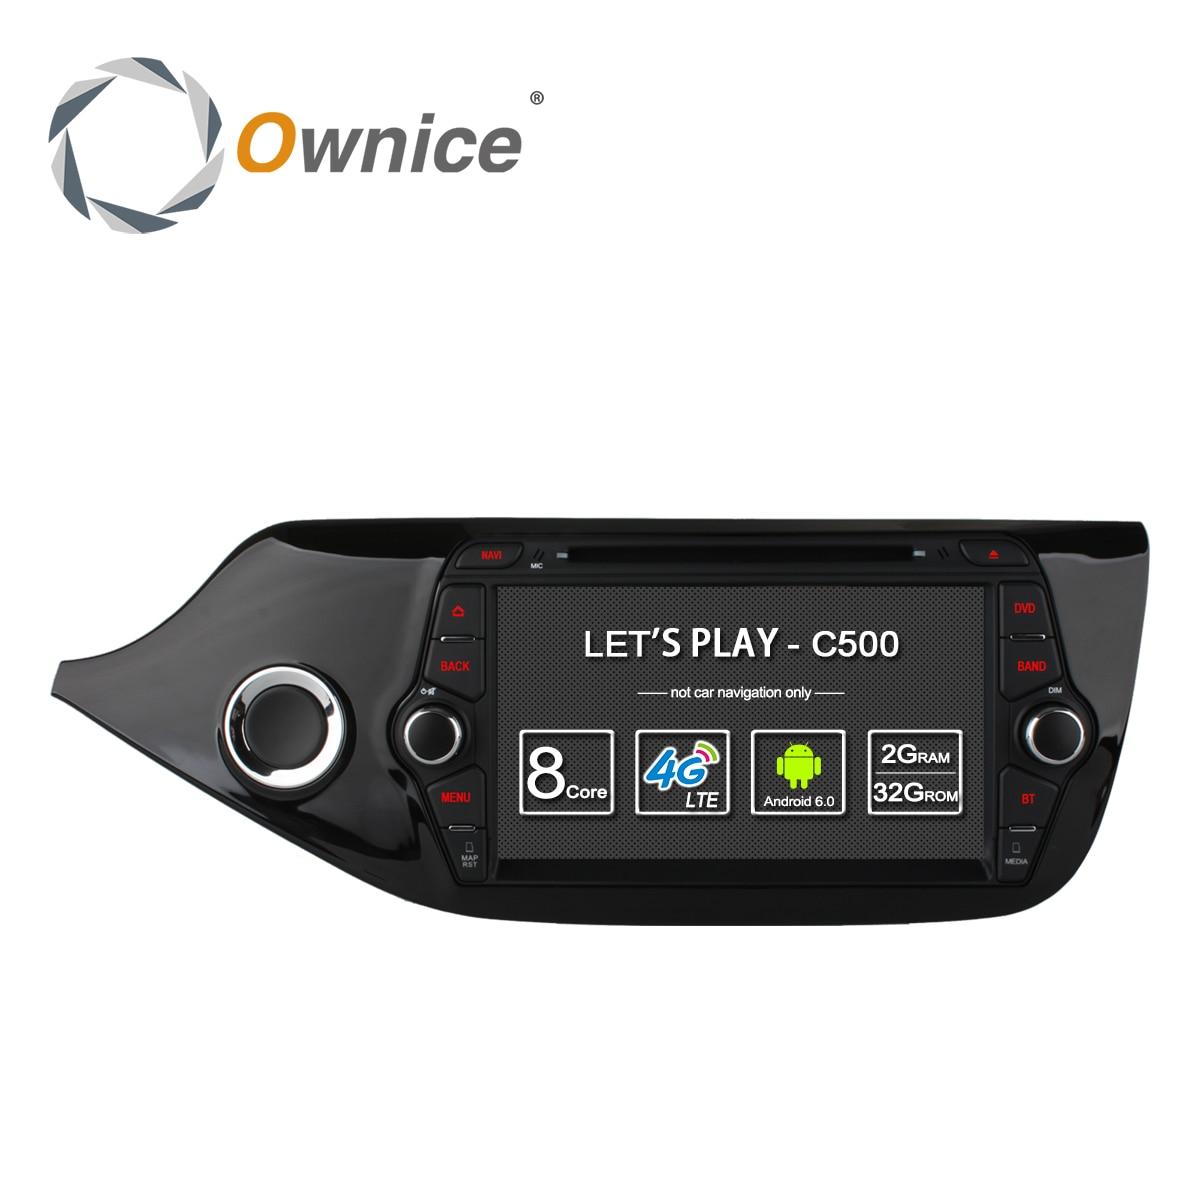 Ownice C500 4G LTE SIM Octa 8 Núcleo Android 6.0 Para Kia CEED 2013-2015 Car DVD Player GPS Navi Radio WIFI 4G BT 2 GB de RAM 32G ROM